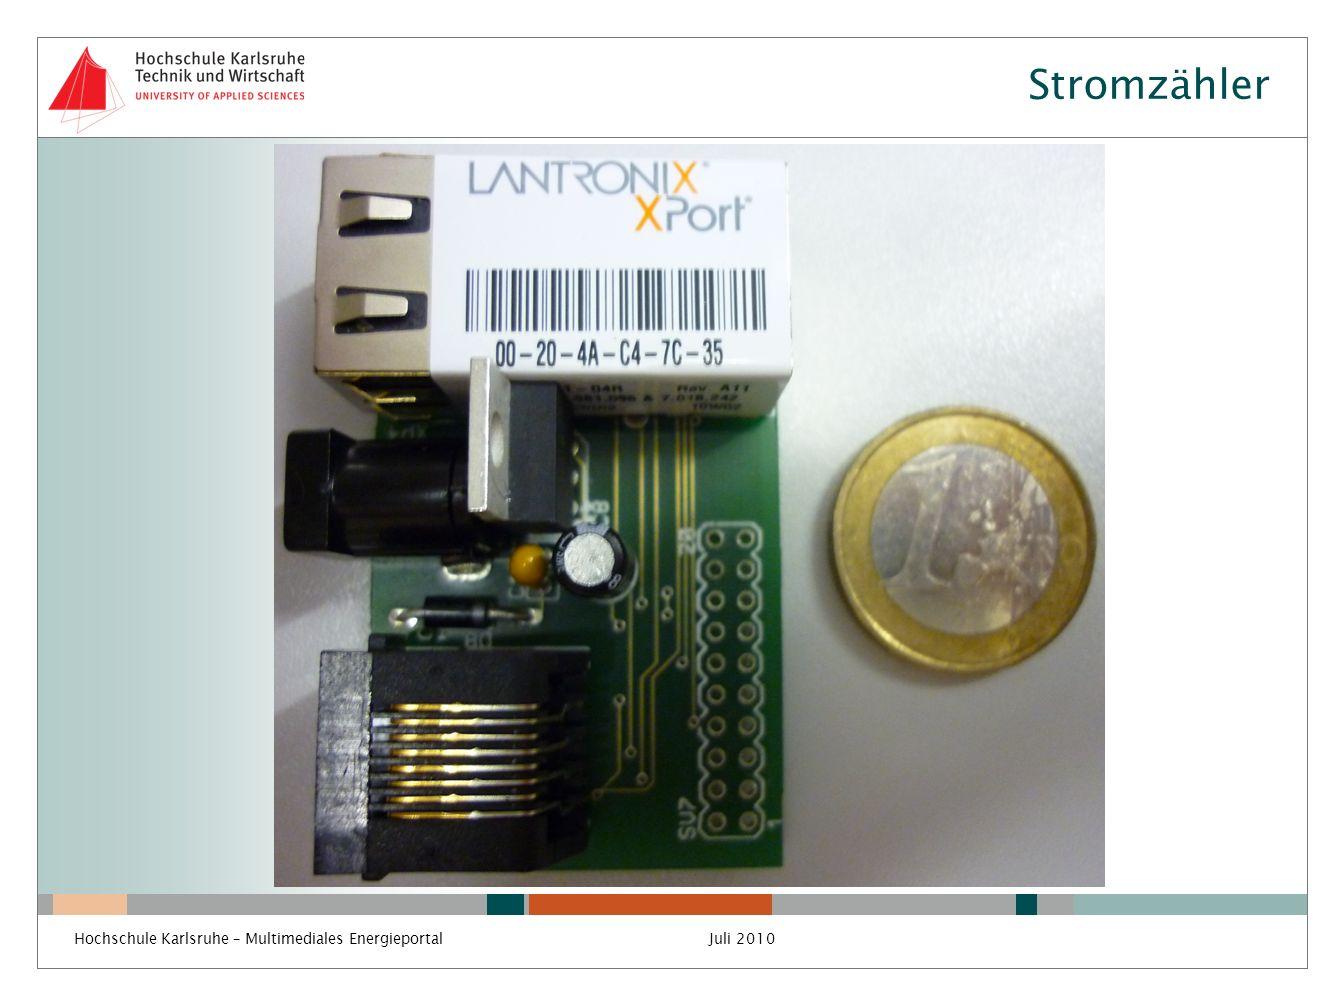 Stromzähler Hochschule Karlsruhe – Multimediales Energieportal